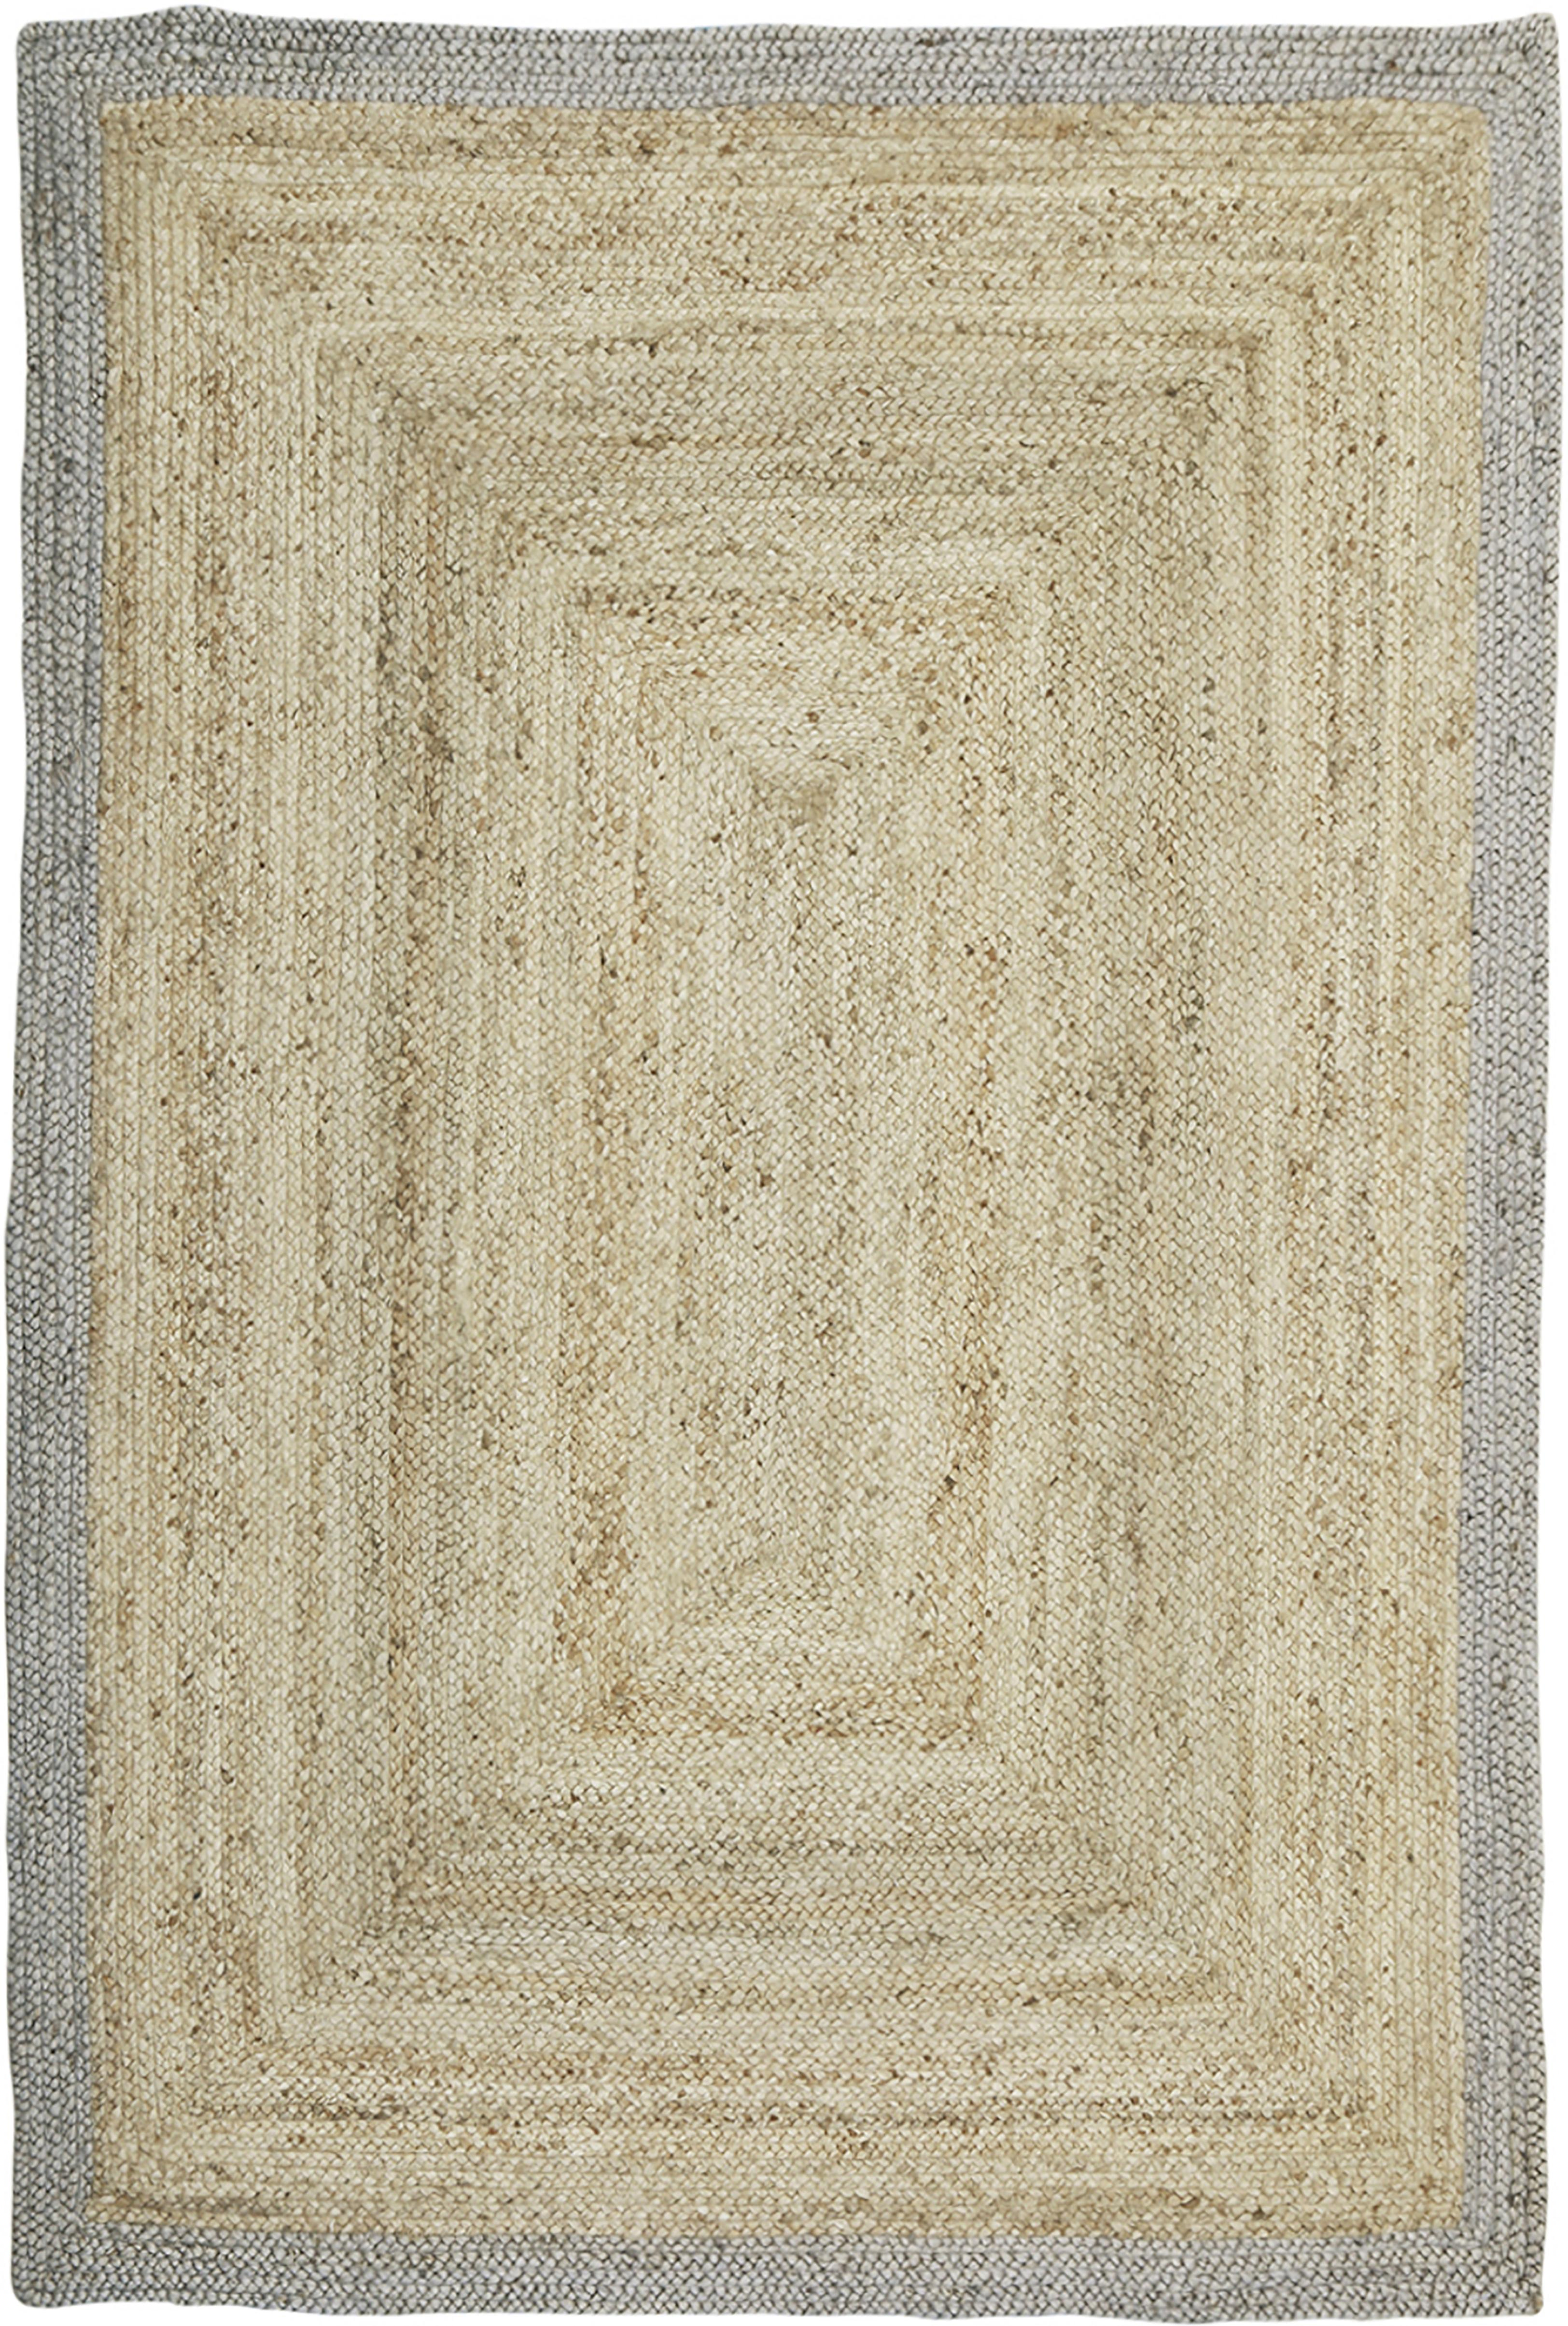 Alfombra artesanal de yute Shanta, Parte superior: yute, Reverso: yute, Beige, gris, An 160 x L 230 cm (Tamaño M)